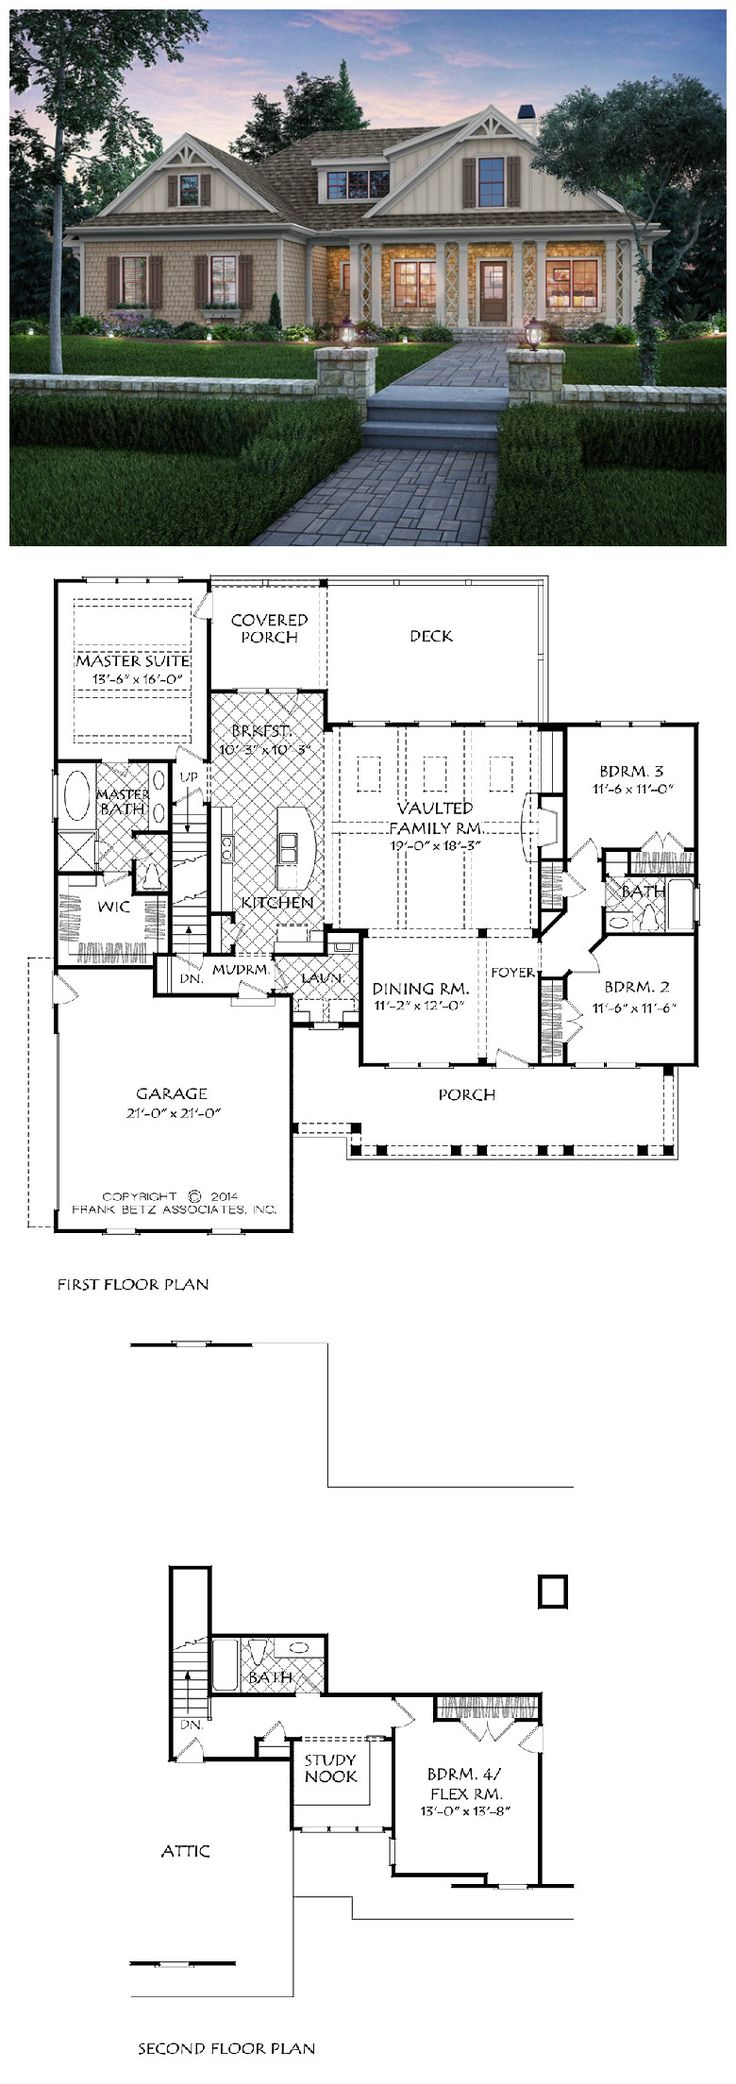 27 best popular frank betz house plans images on pinterest house aspen ridge is a 2295sqft frankbetz openfloorconcept plan w large kitchen and a